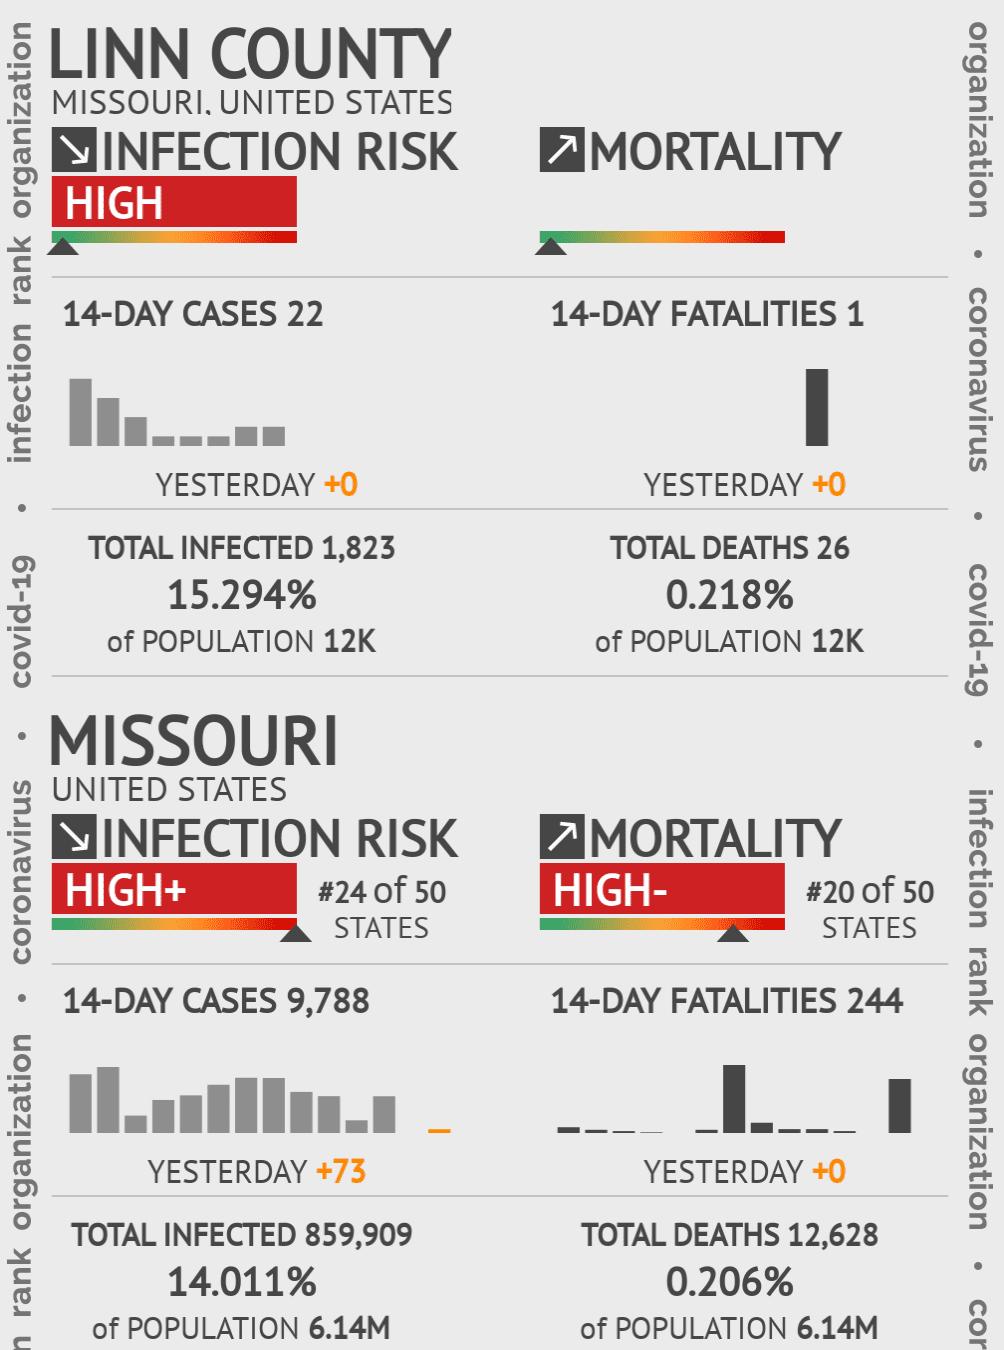 Linn County Coronavirus Covid-19 Risk of Infection on March 23, 2021